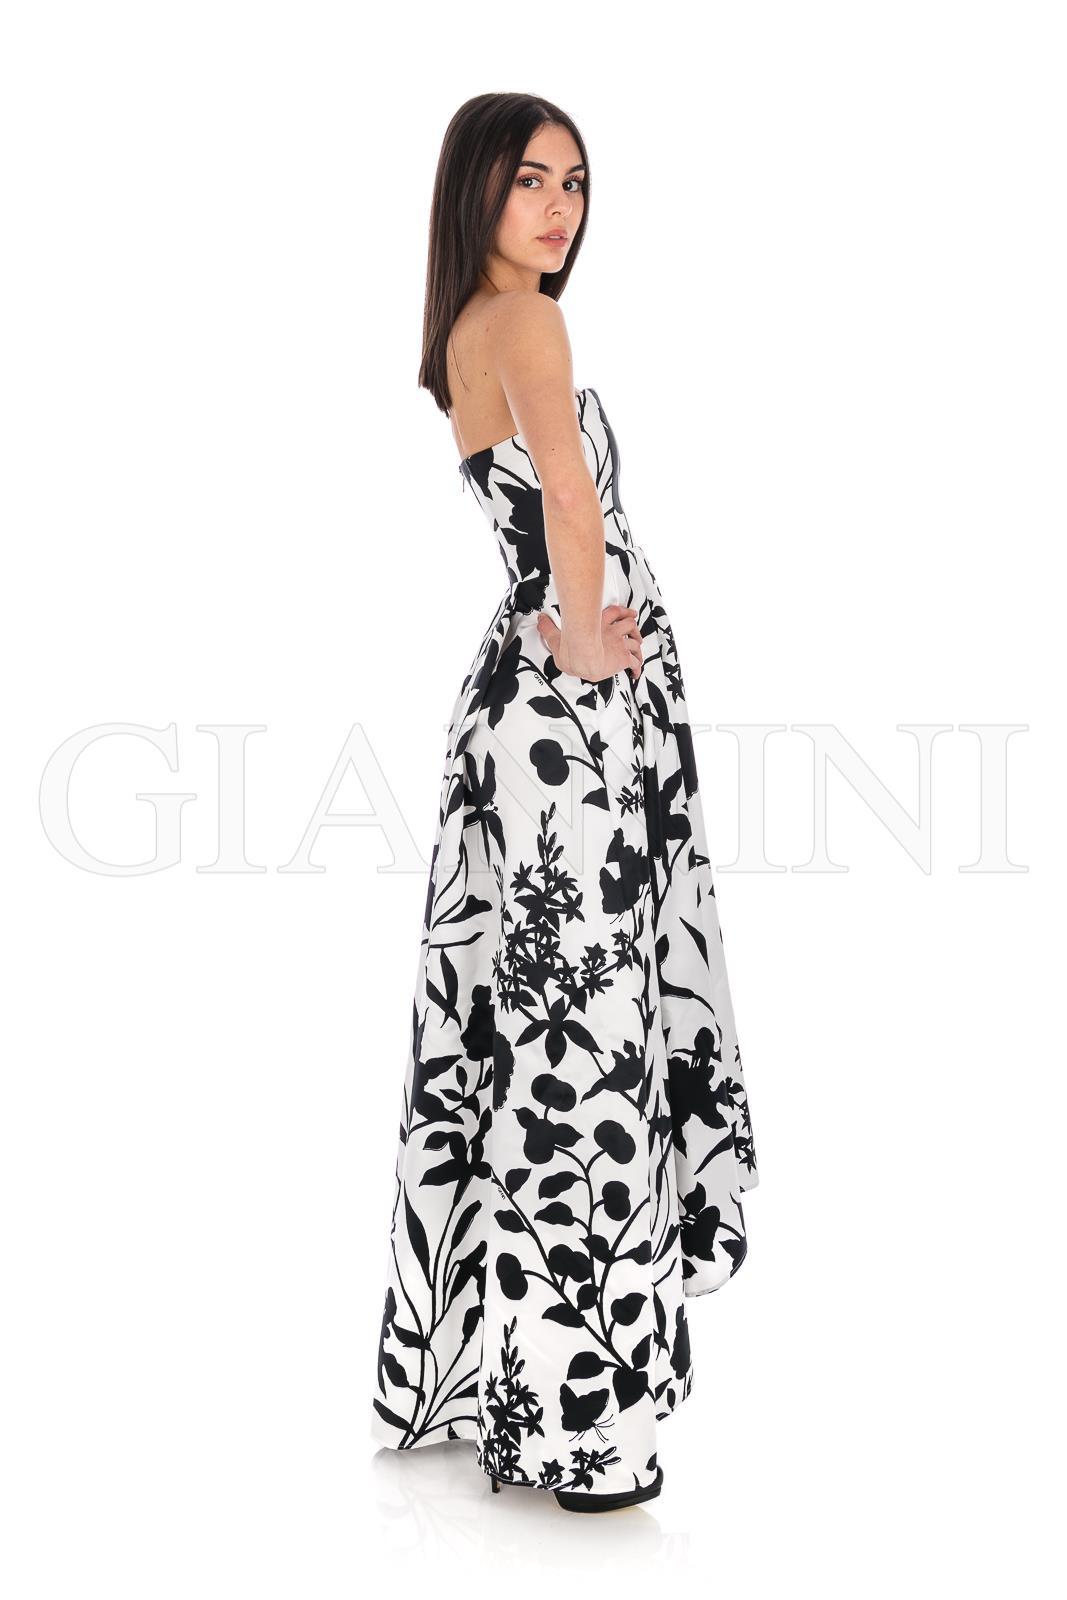 low cost 5b864 8f042 LIU°JO Dress I19222T2296 for Women | GianniniShopOnline.com